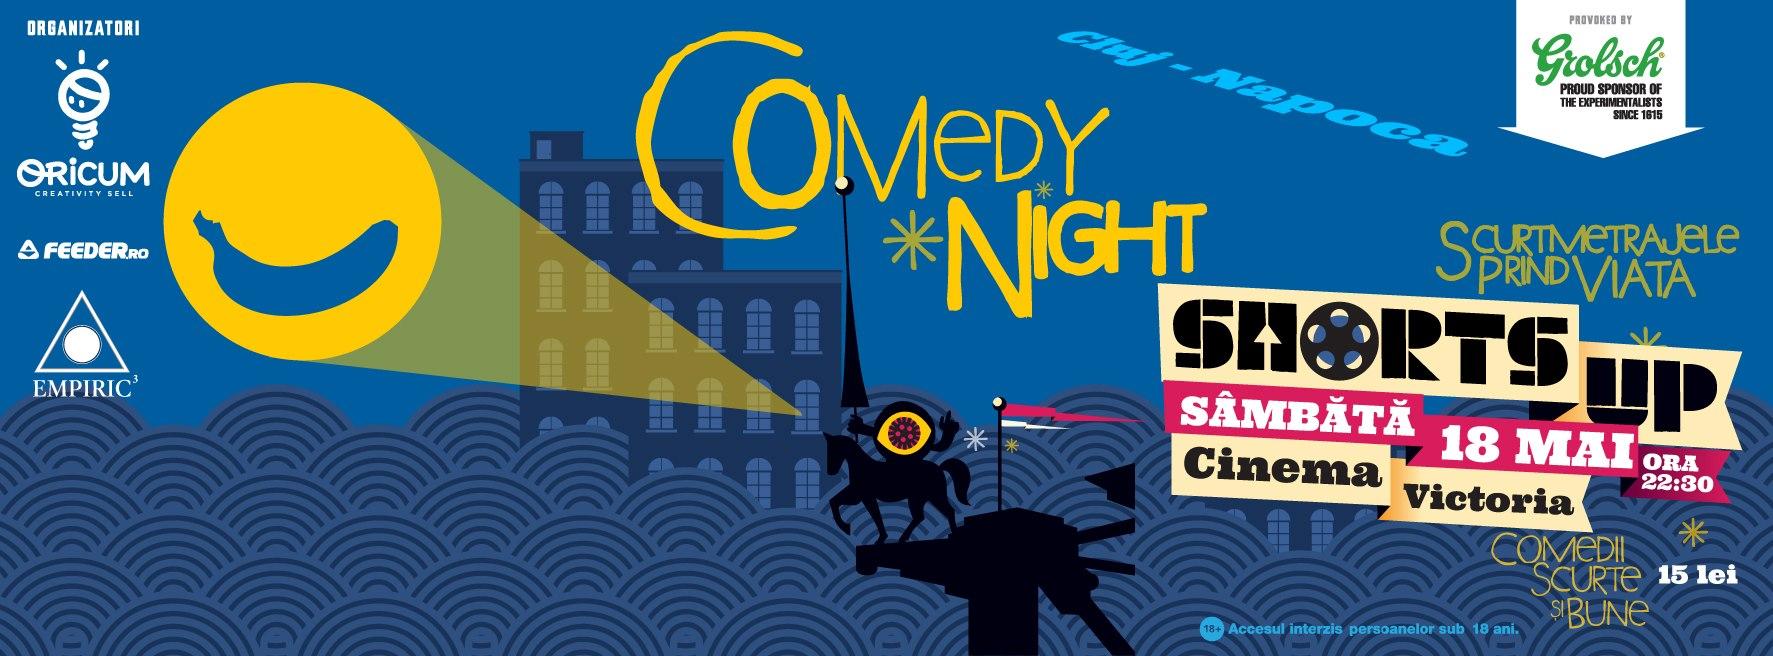 ShortsUp Comedy Night @ Cinema Victoria